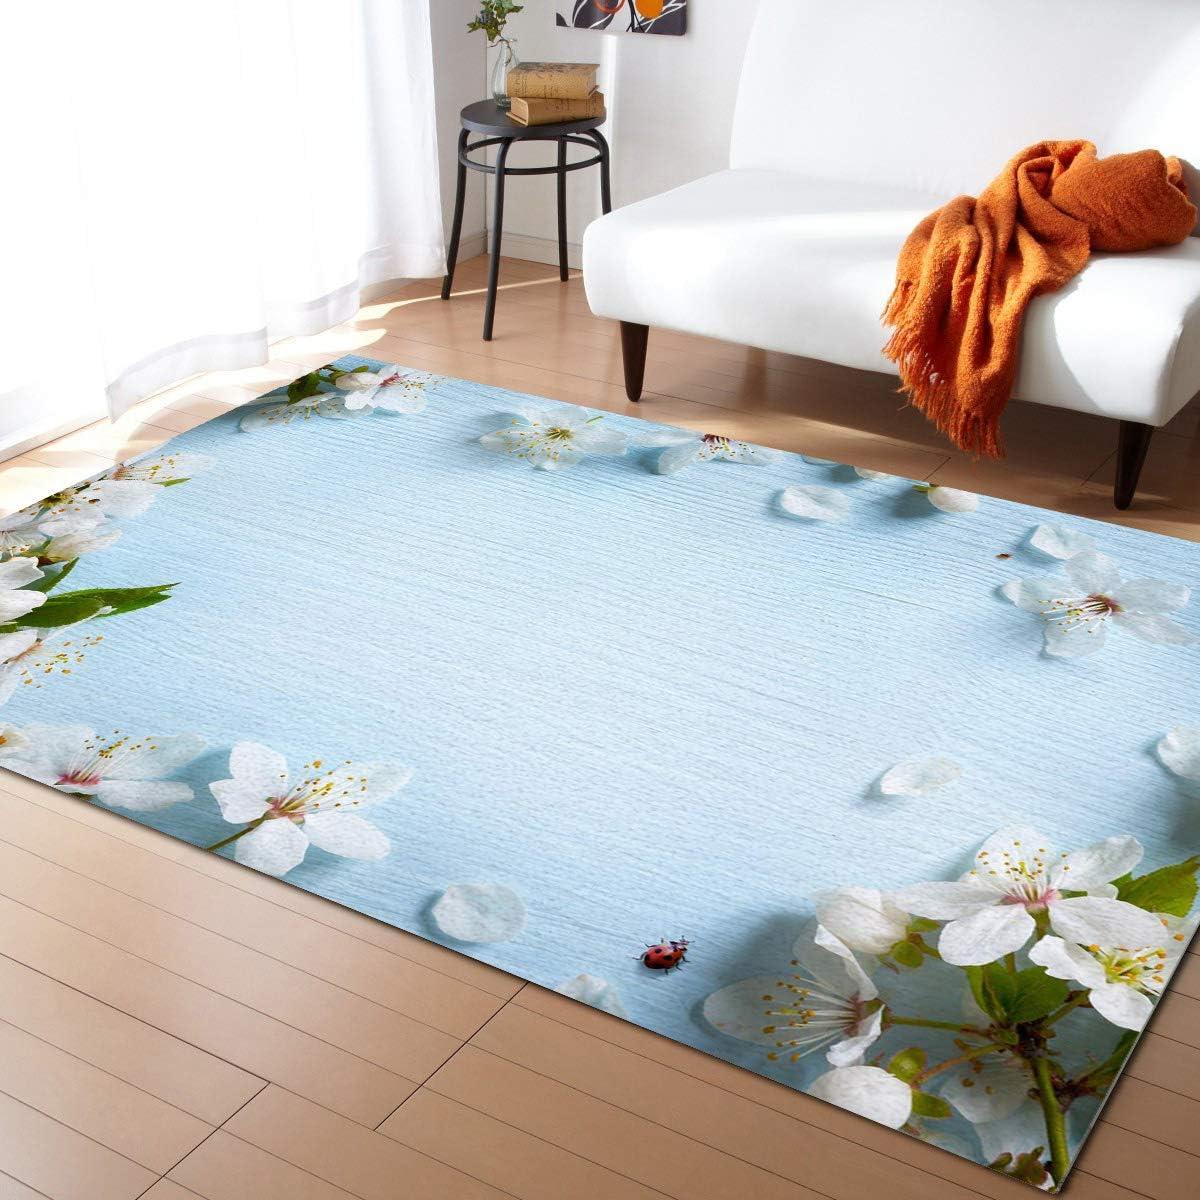 Olivefox Jacksonville Mall 2x3 Feet Floor Mat Area Blue Rug Ranking TOP13 White Flowers on Wood